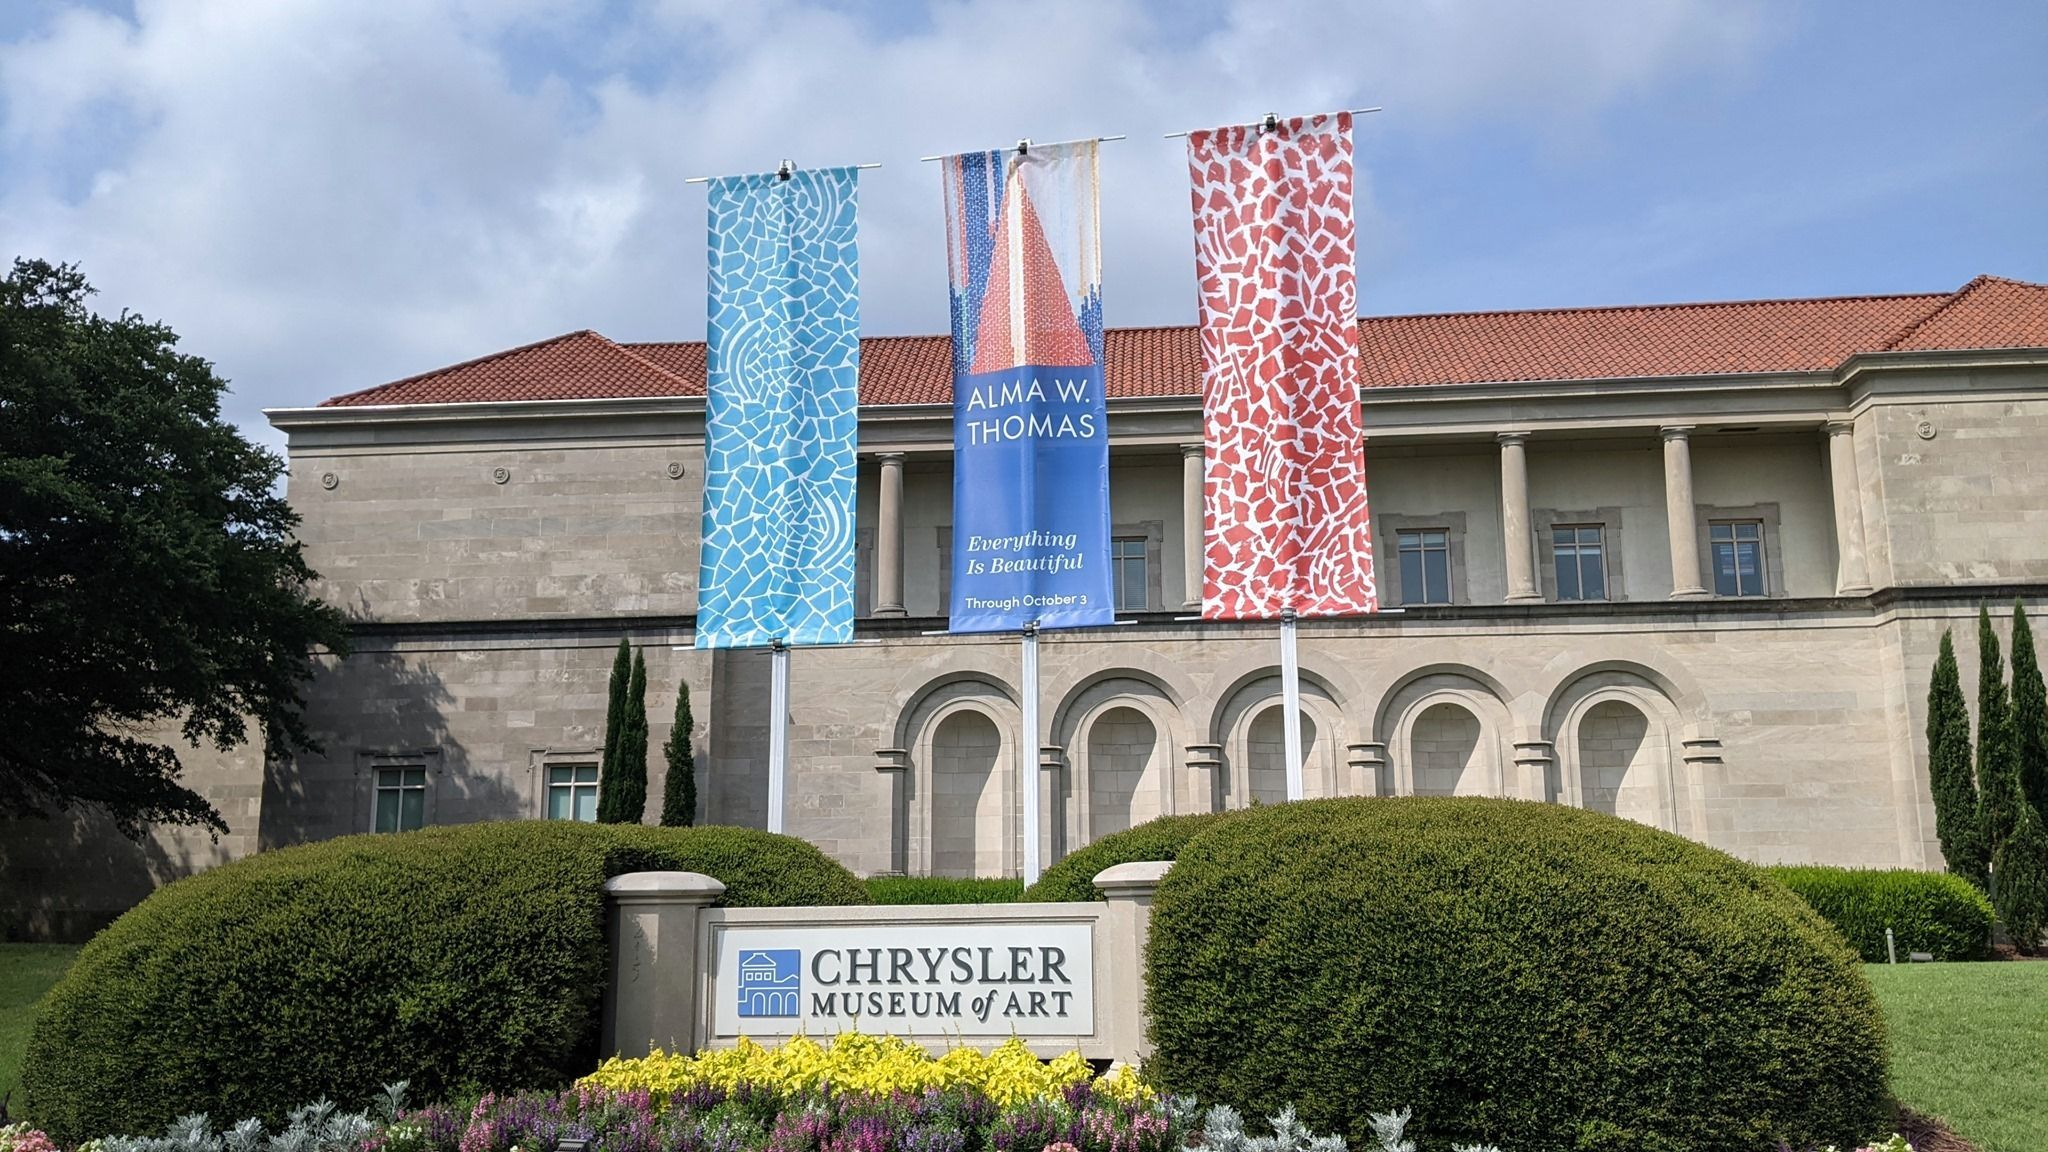 The Chrysler Museum of Art Shop